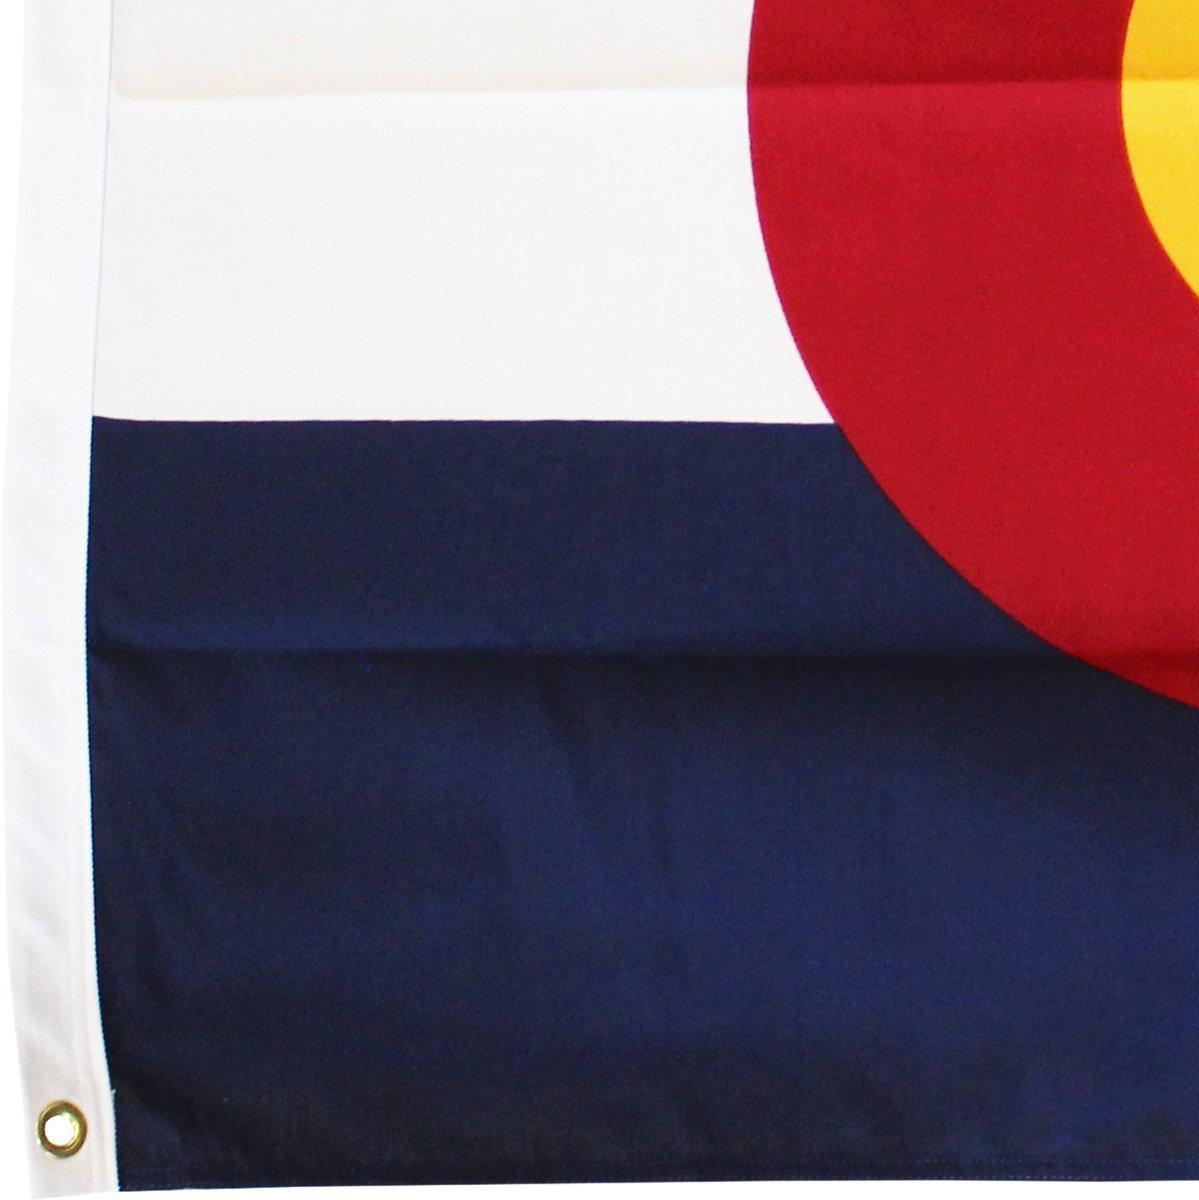 Colorado - 3'X5' Heavy Duty 2-Ply Polyester Flag